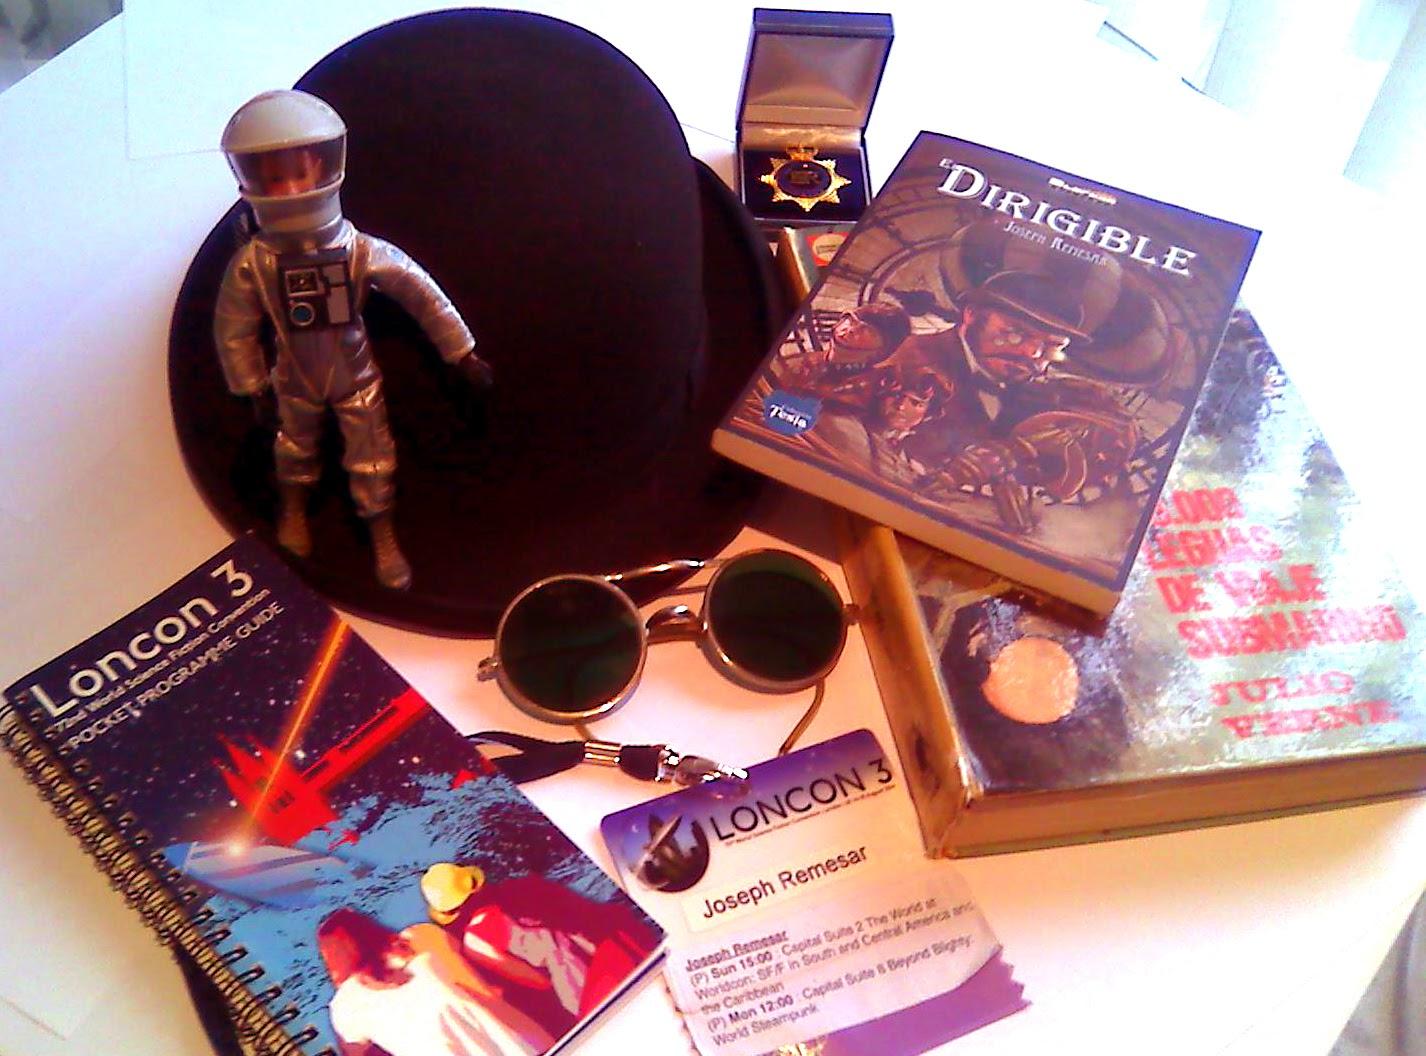 Loncon3 Literatura steampunk